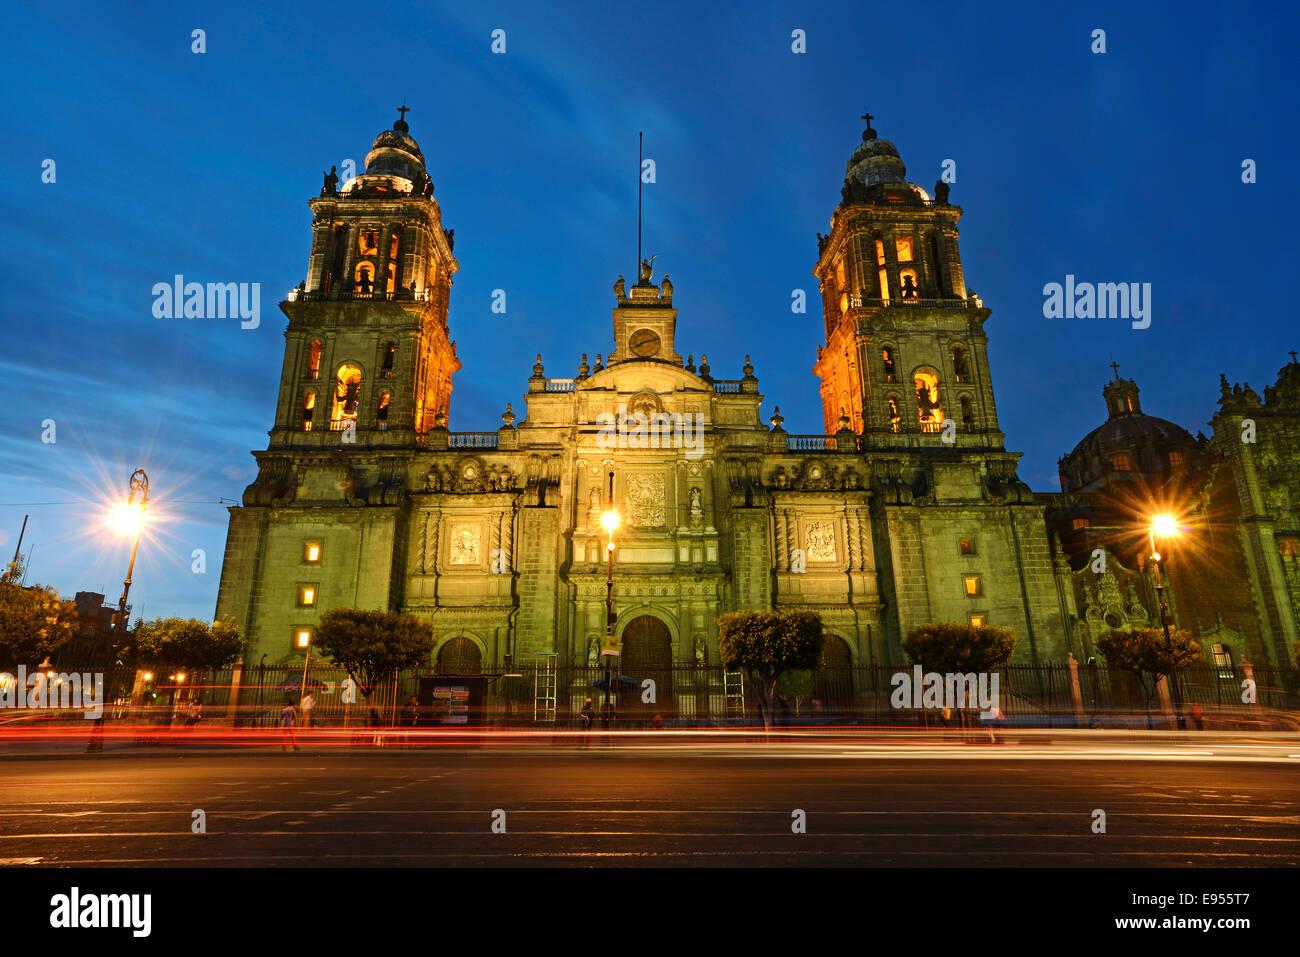 Mexico City Metropolitan Cathedral, Catedral Metropolitana de la Asuncion de Maria, Plaza de la Constitucion, and - Stock Image